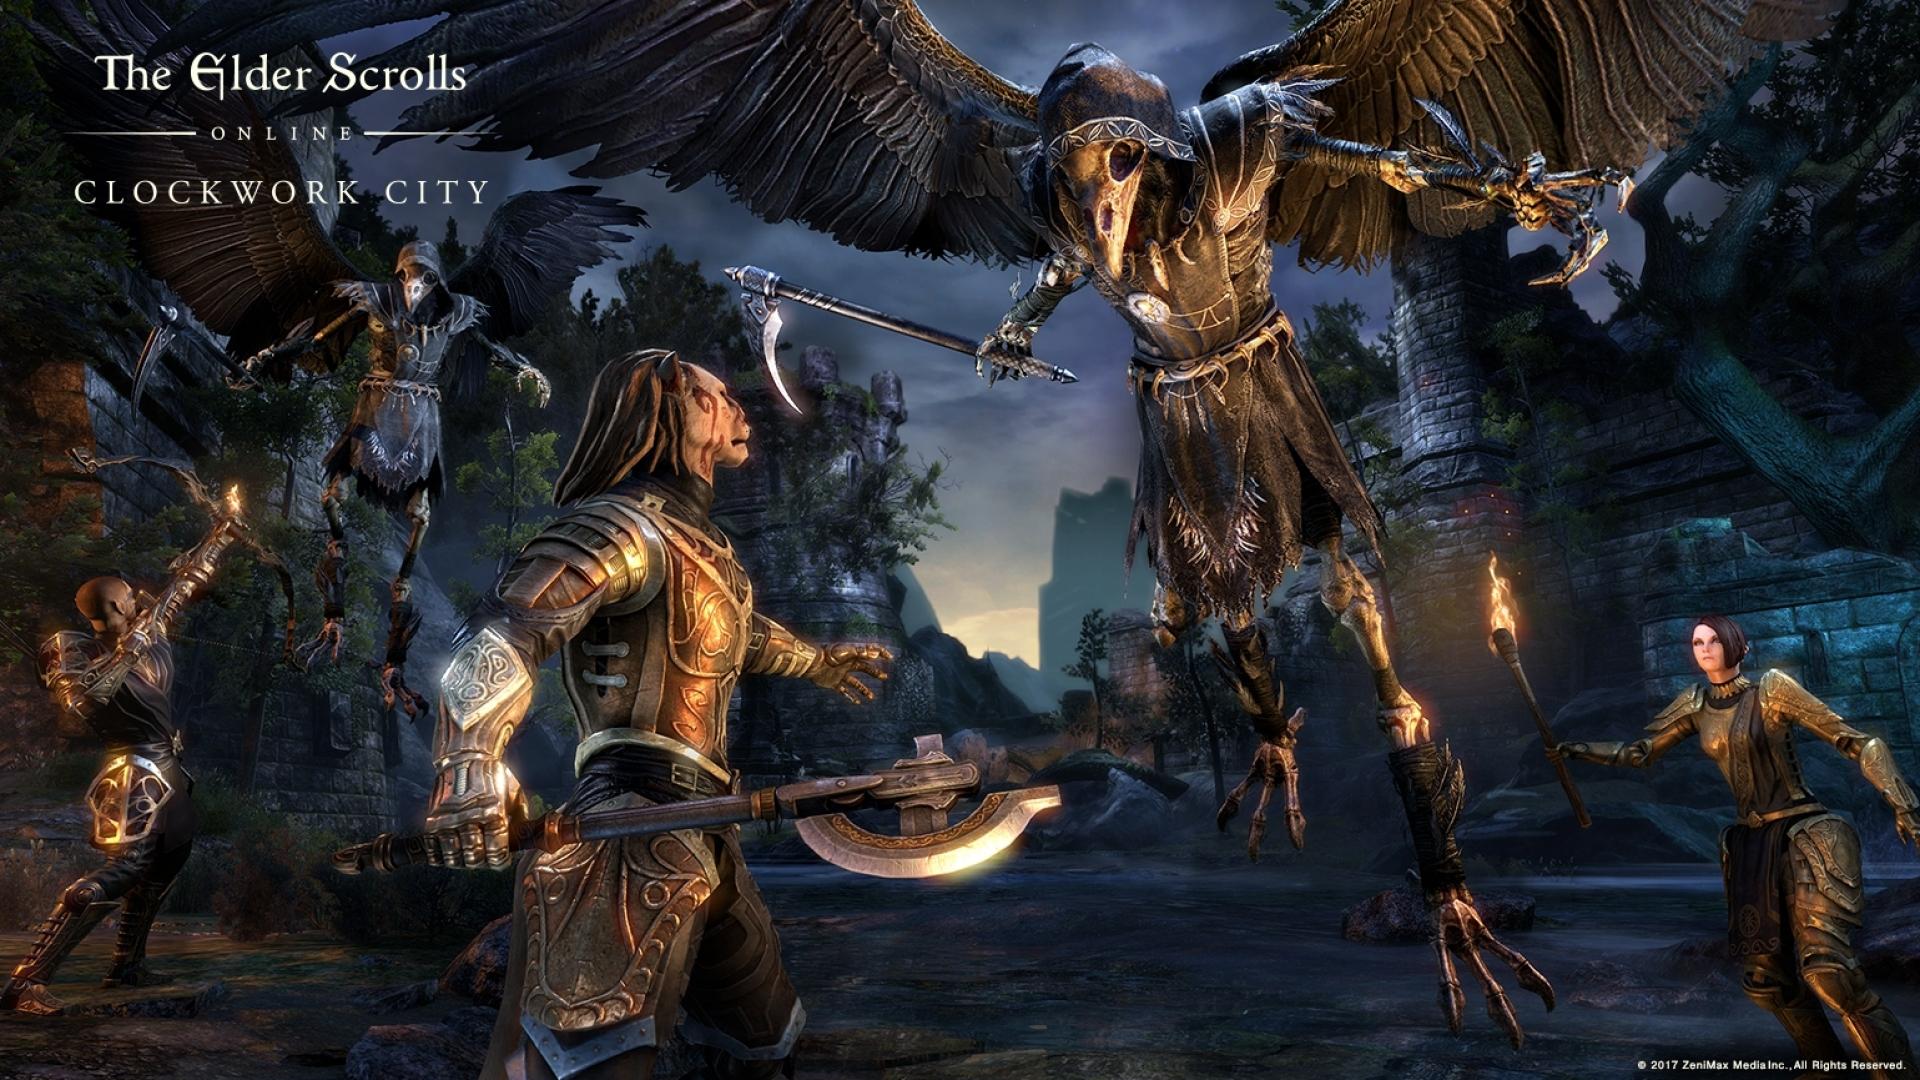 Media The Elder Scrolls Online